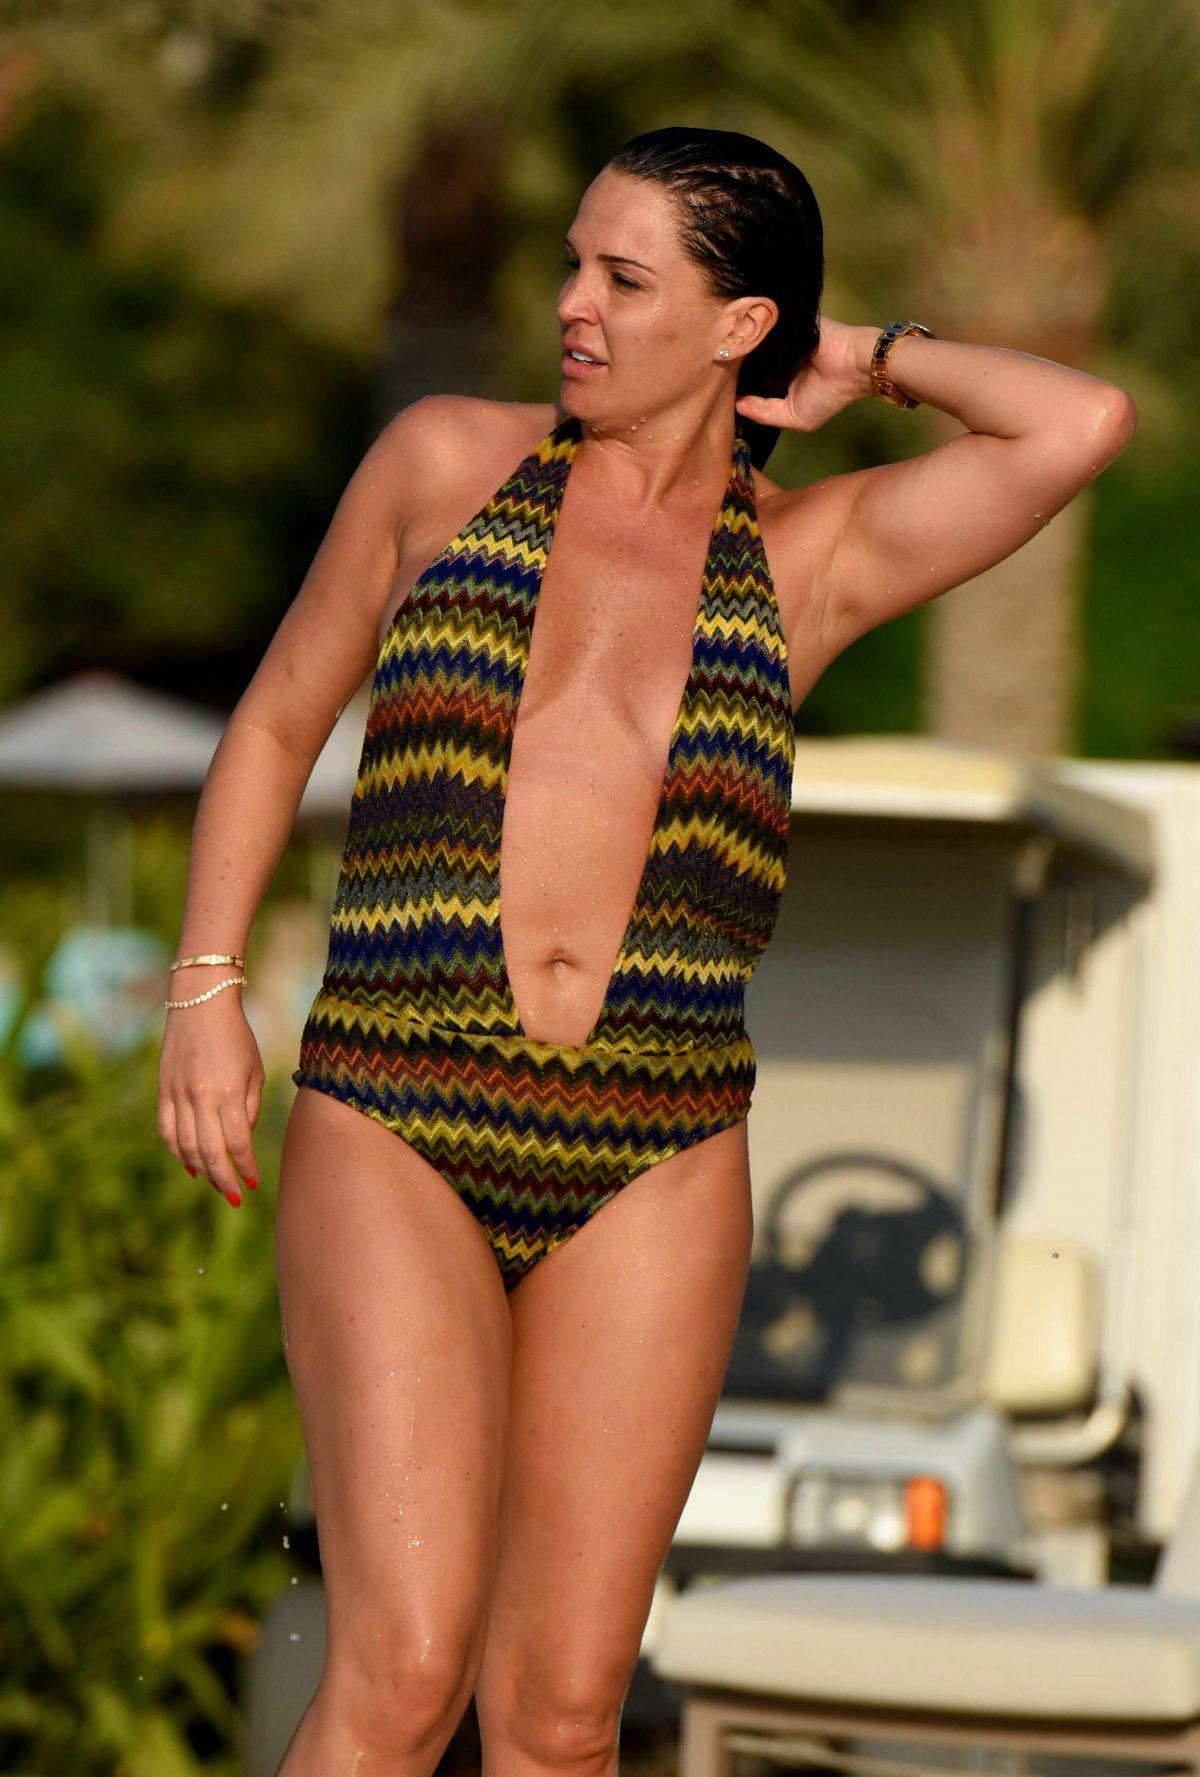 DANIELLE LLOYD in Swimsuit at a Pool in Dubai 11/28/2016